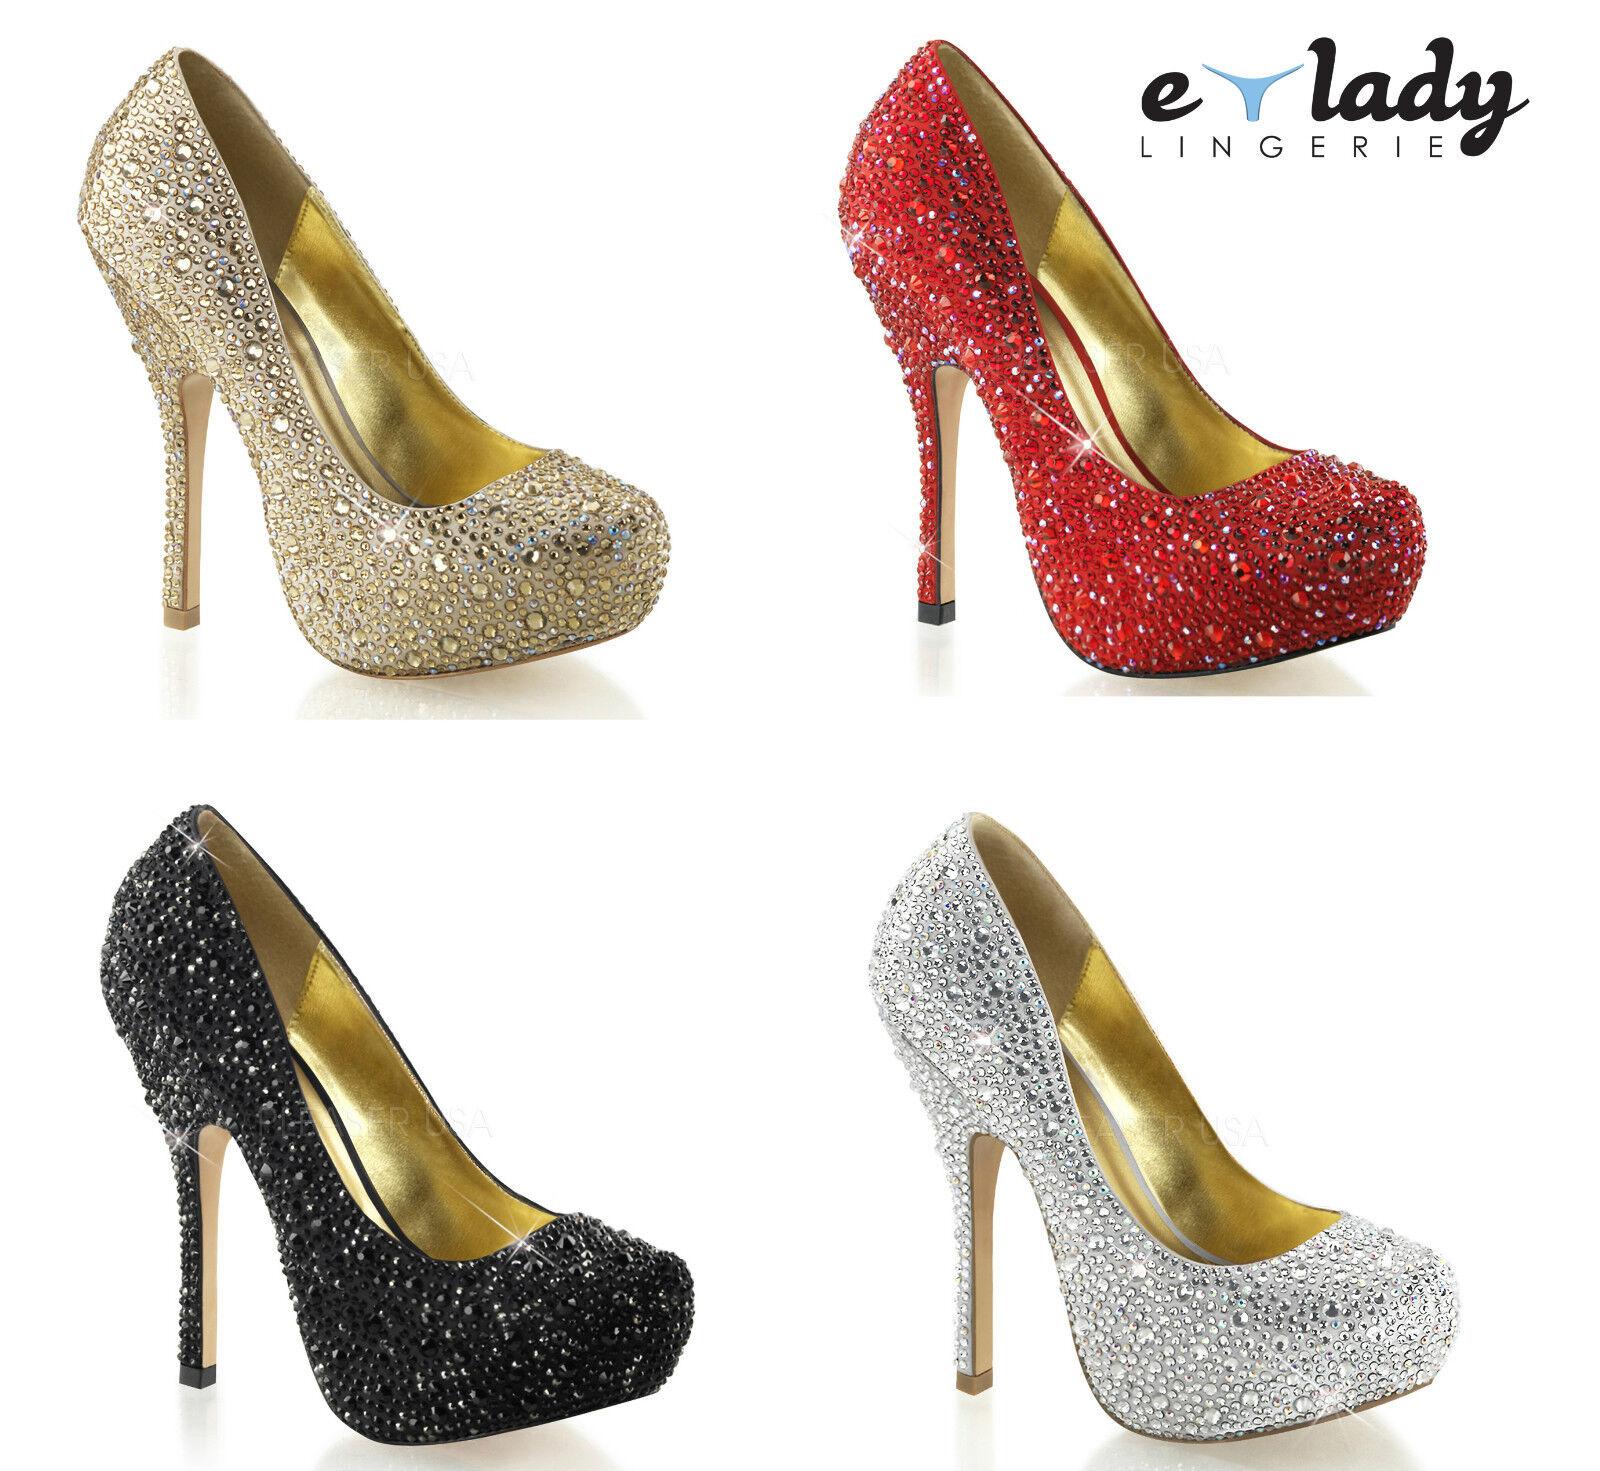 Pleaser Felicity-20 damen Court schuhe Pumps 5  Stilettos High Heels Platform  | Kompletter Spezifikationsbereich